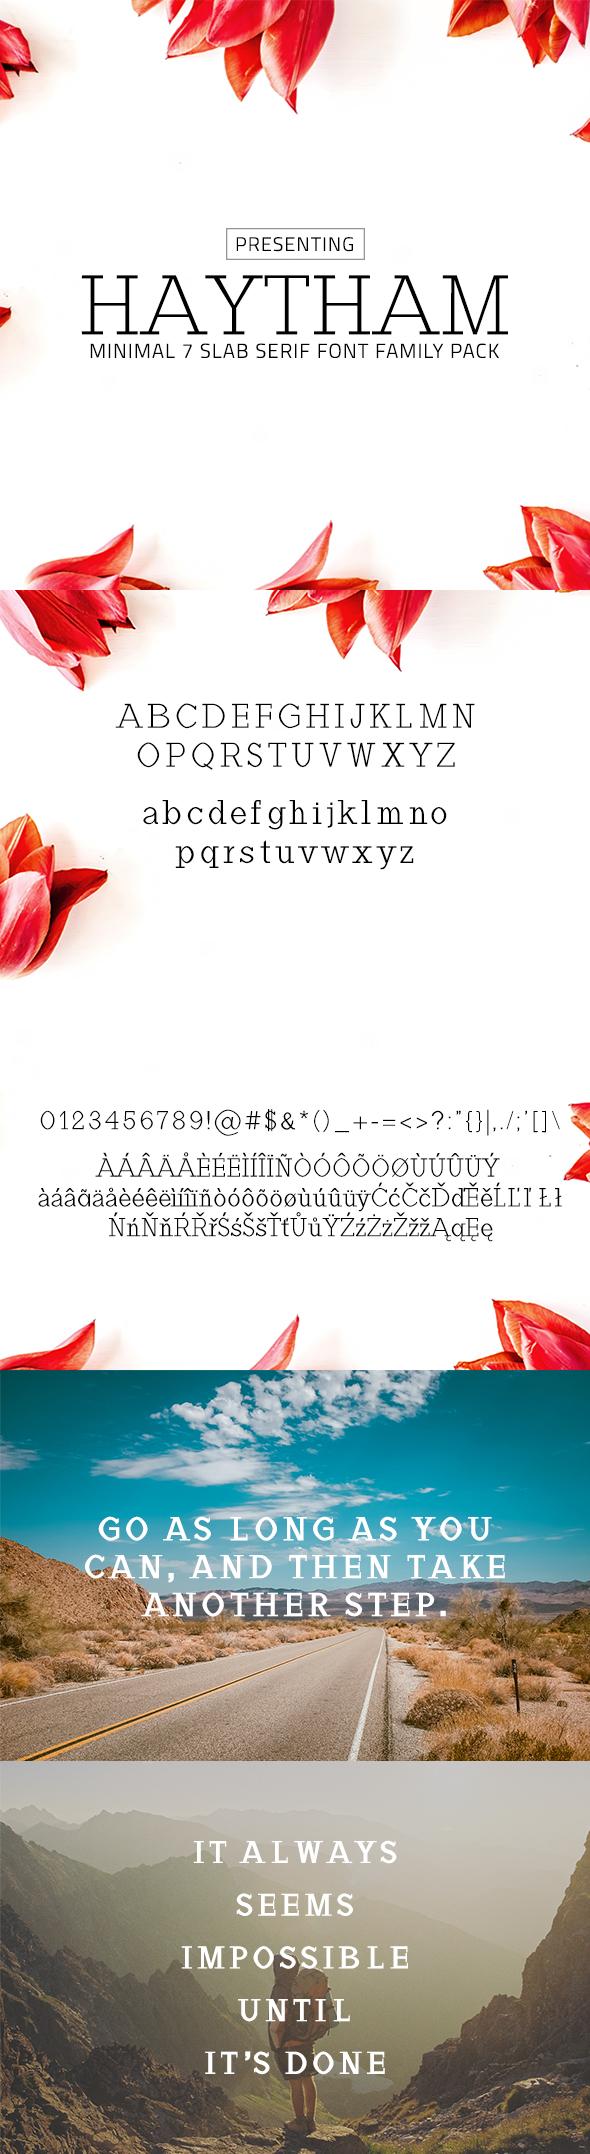 Haytham Minimal Slab Serif Typeface - Serif Fonts